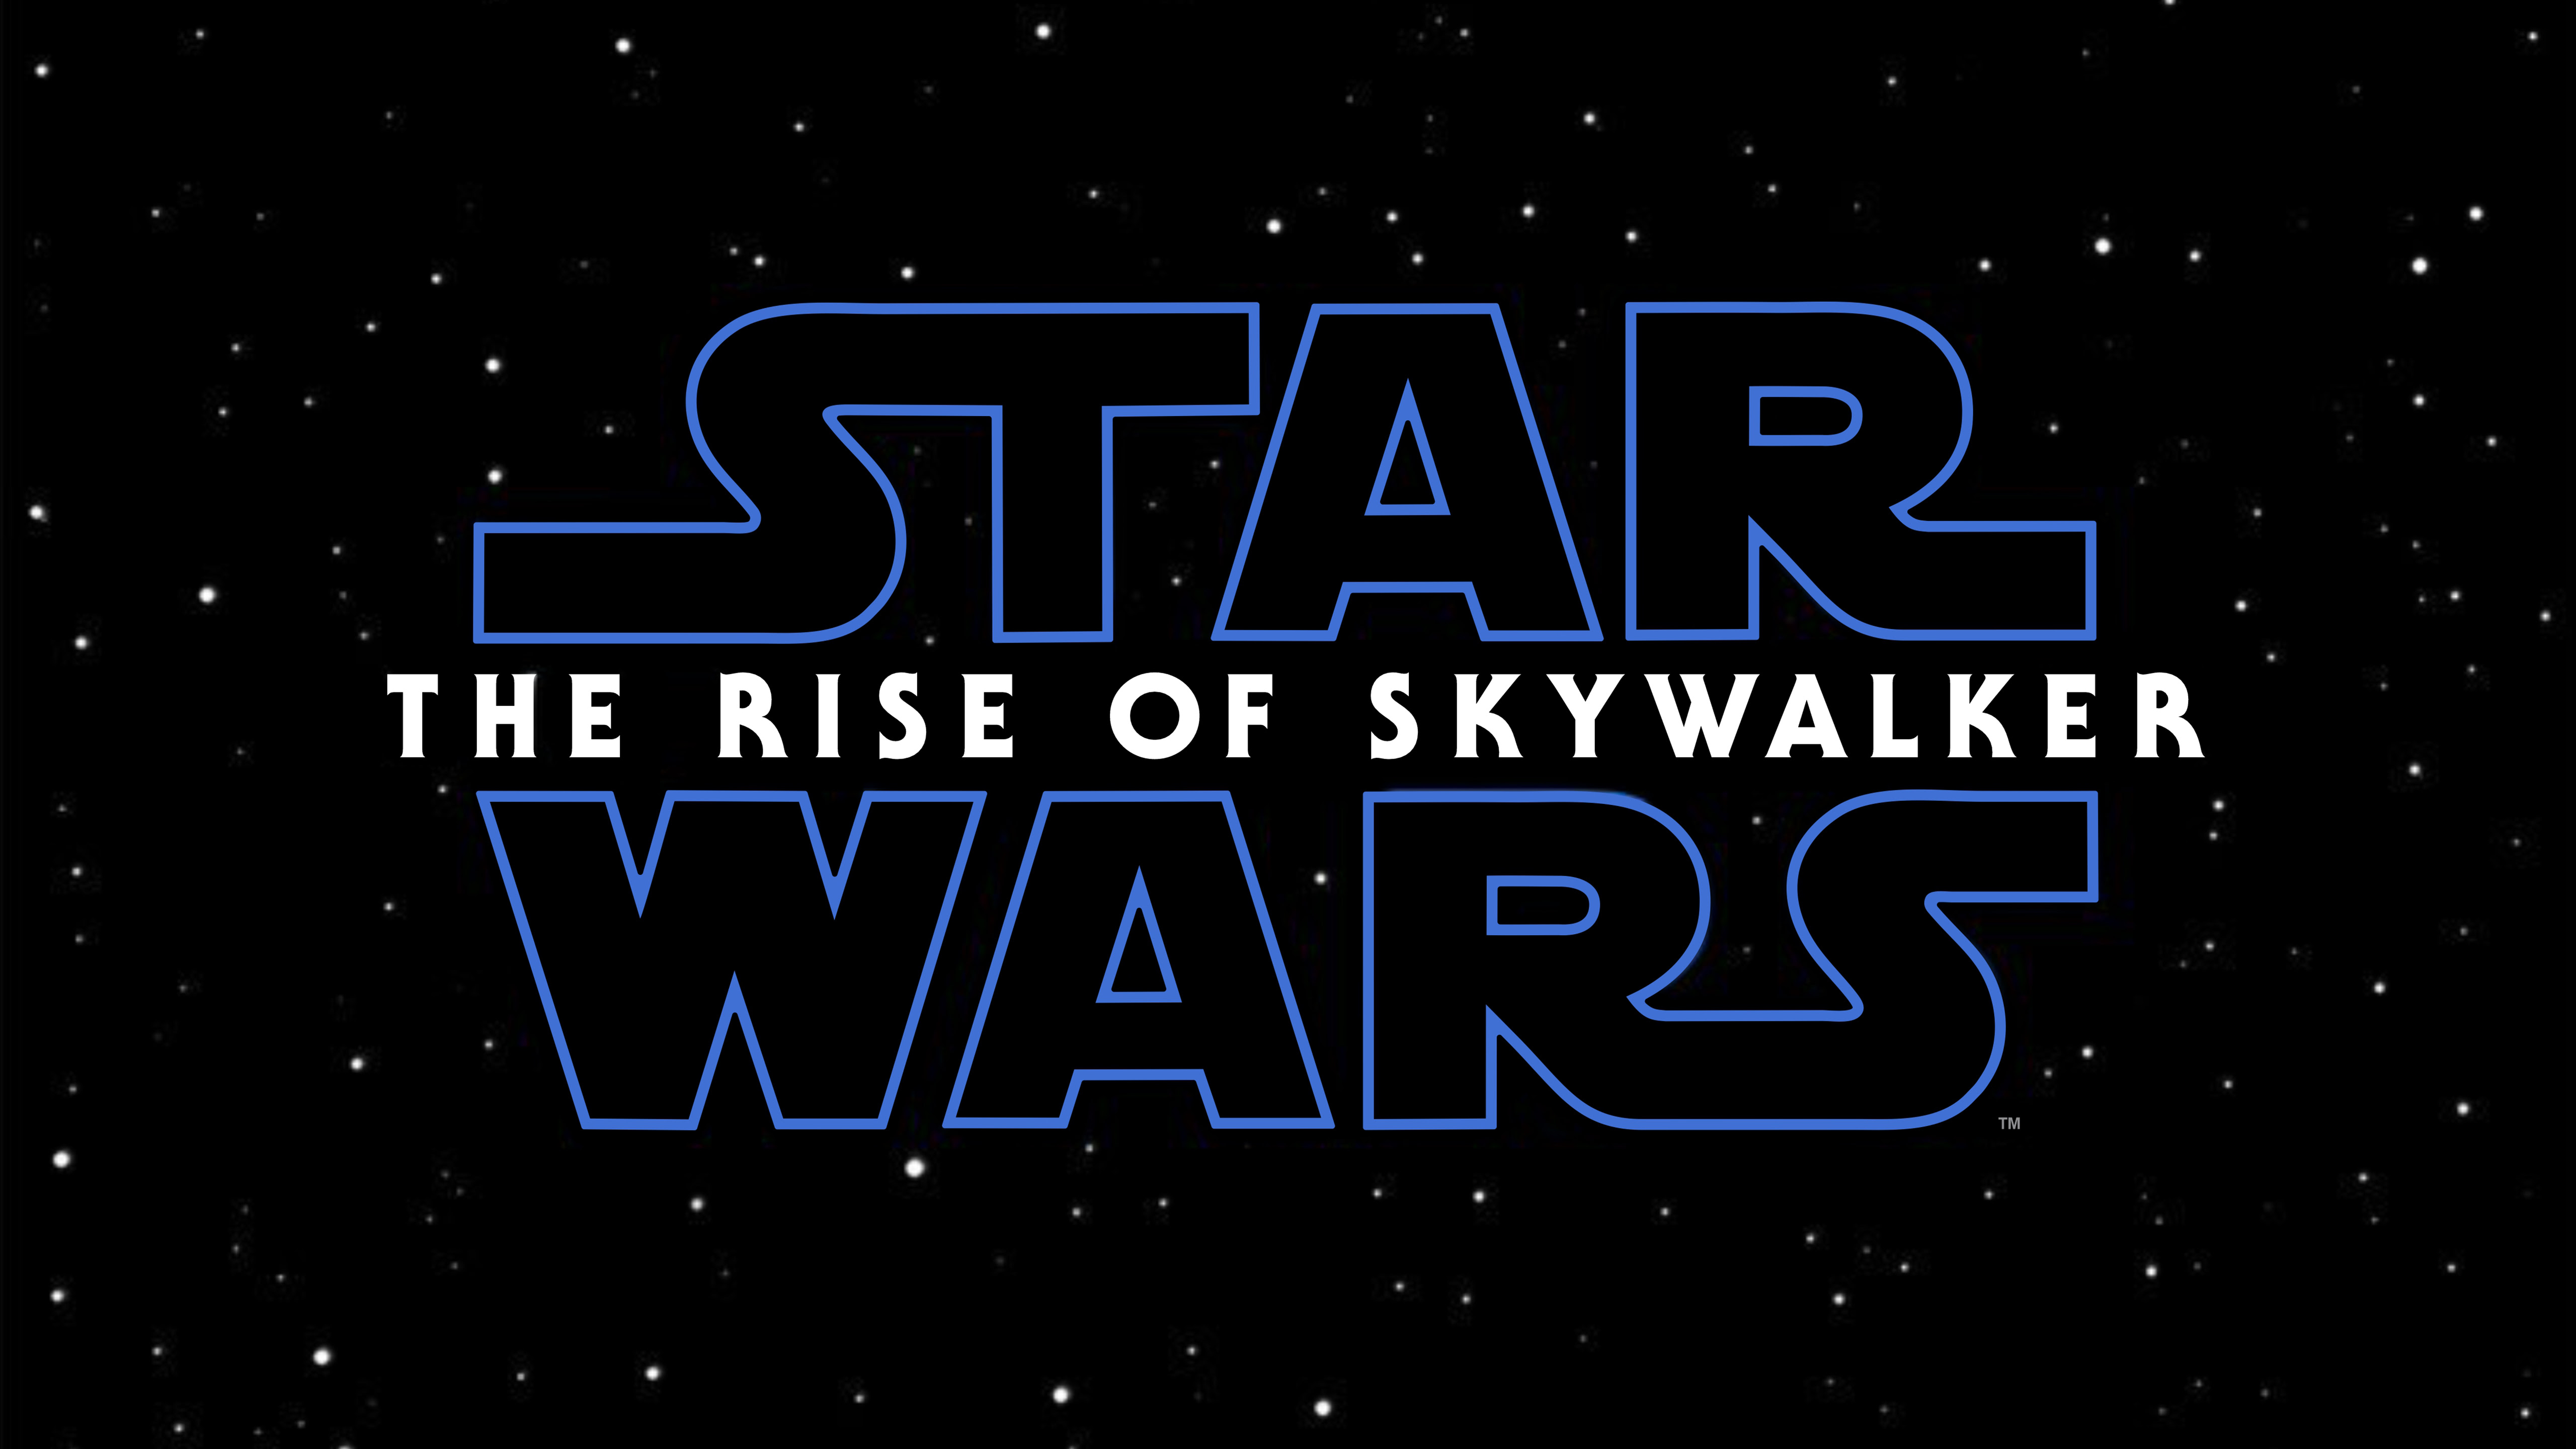 Star Wars The Rise Of Skywalker 2019 5k Wallpapers Hd Wallpapers